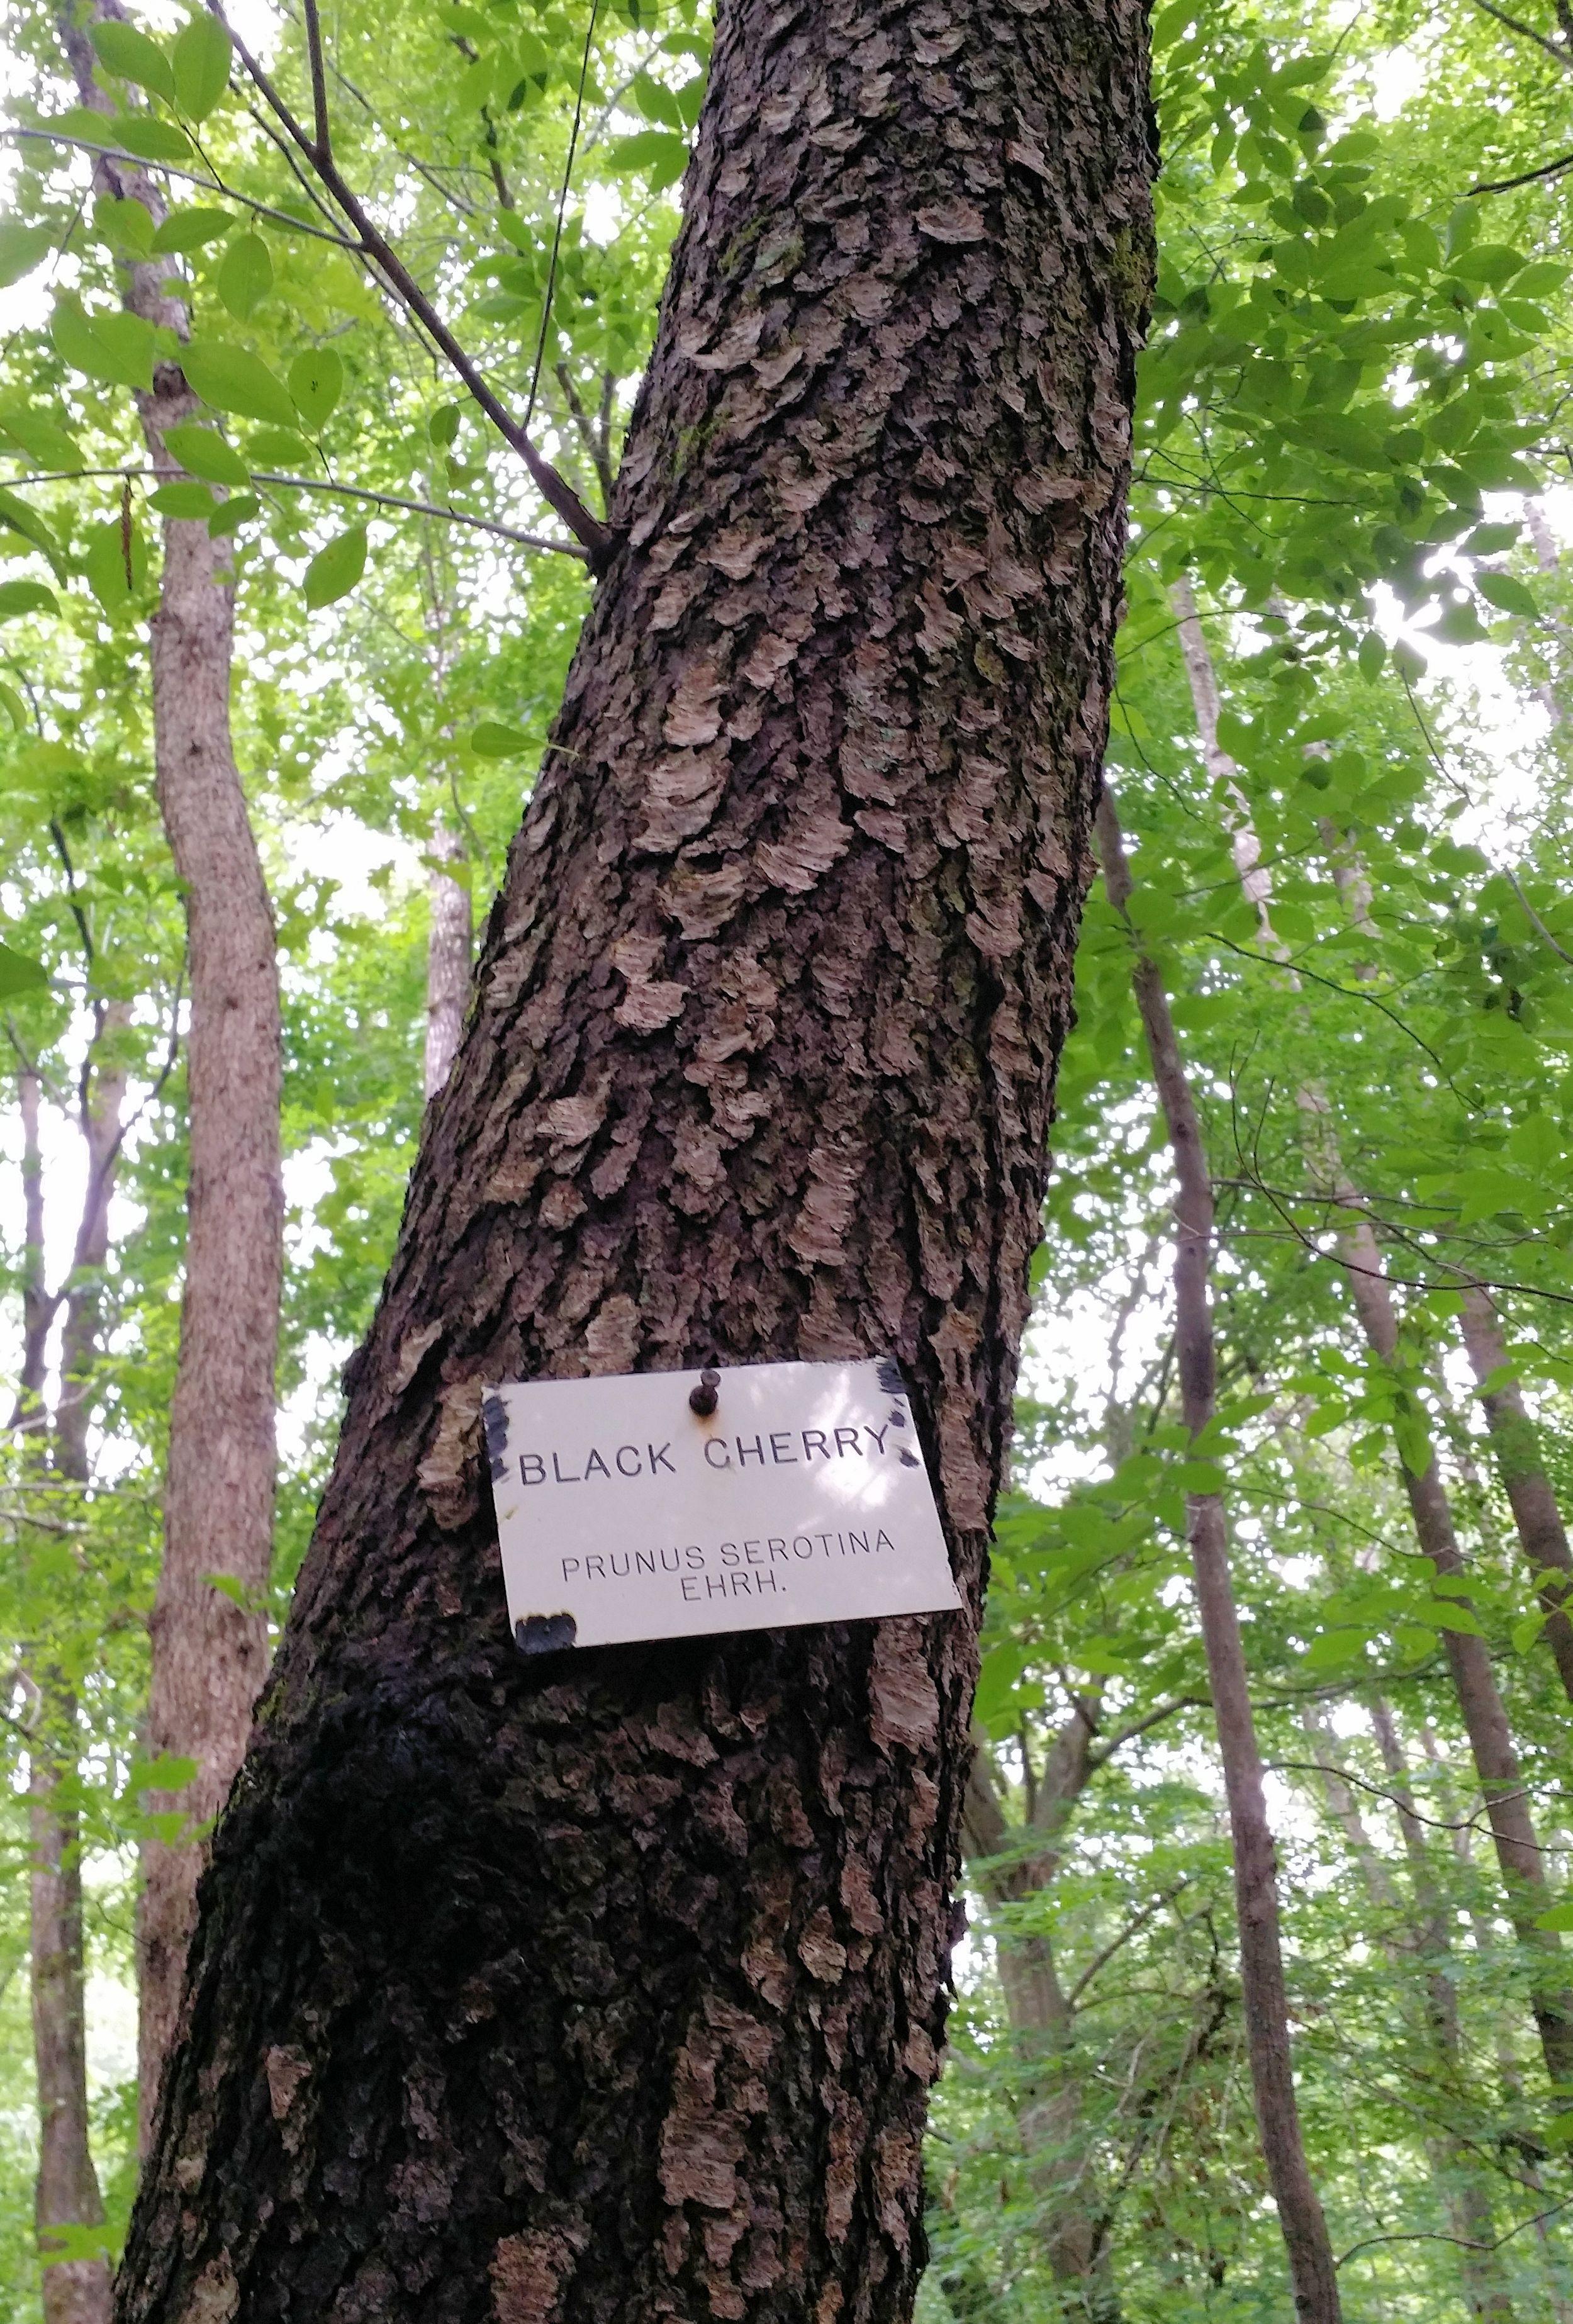 Black Cherry Tree Black Cherry Tree Tree Arboretum